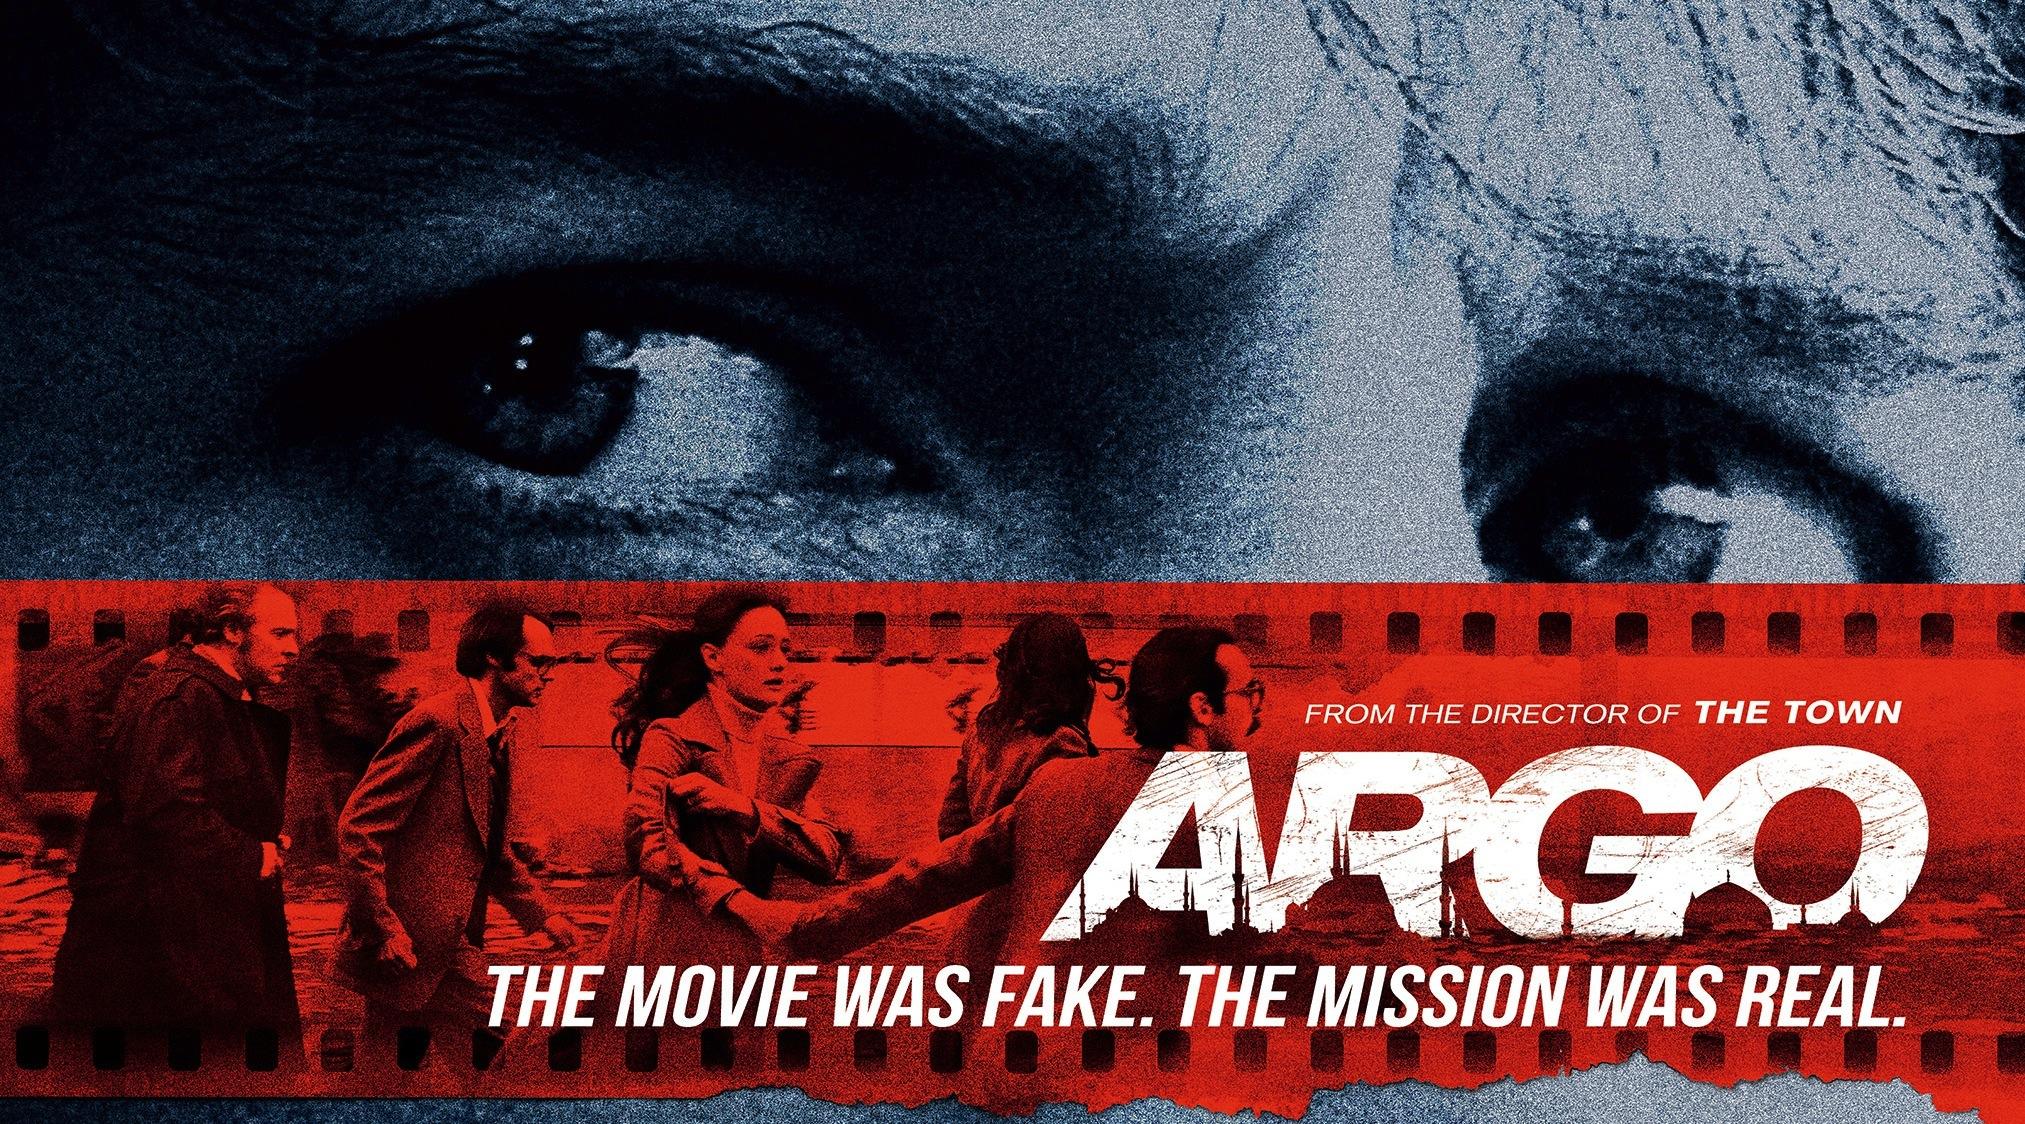 http://moviefail.files.wordpress.com/2012/10/argo1.jpg